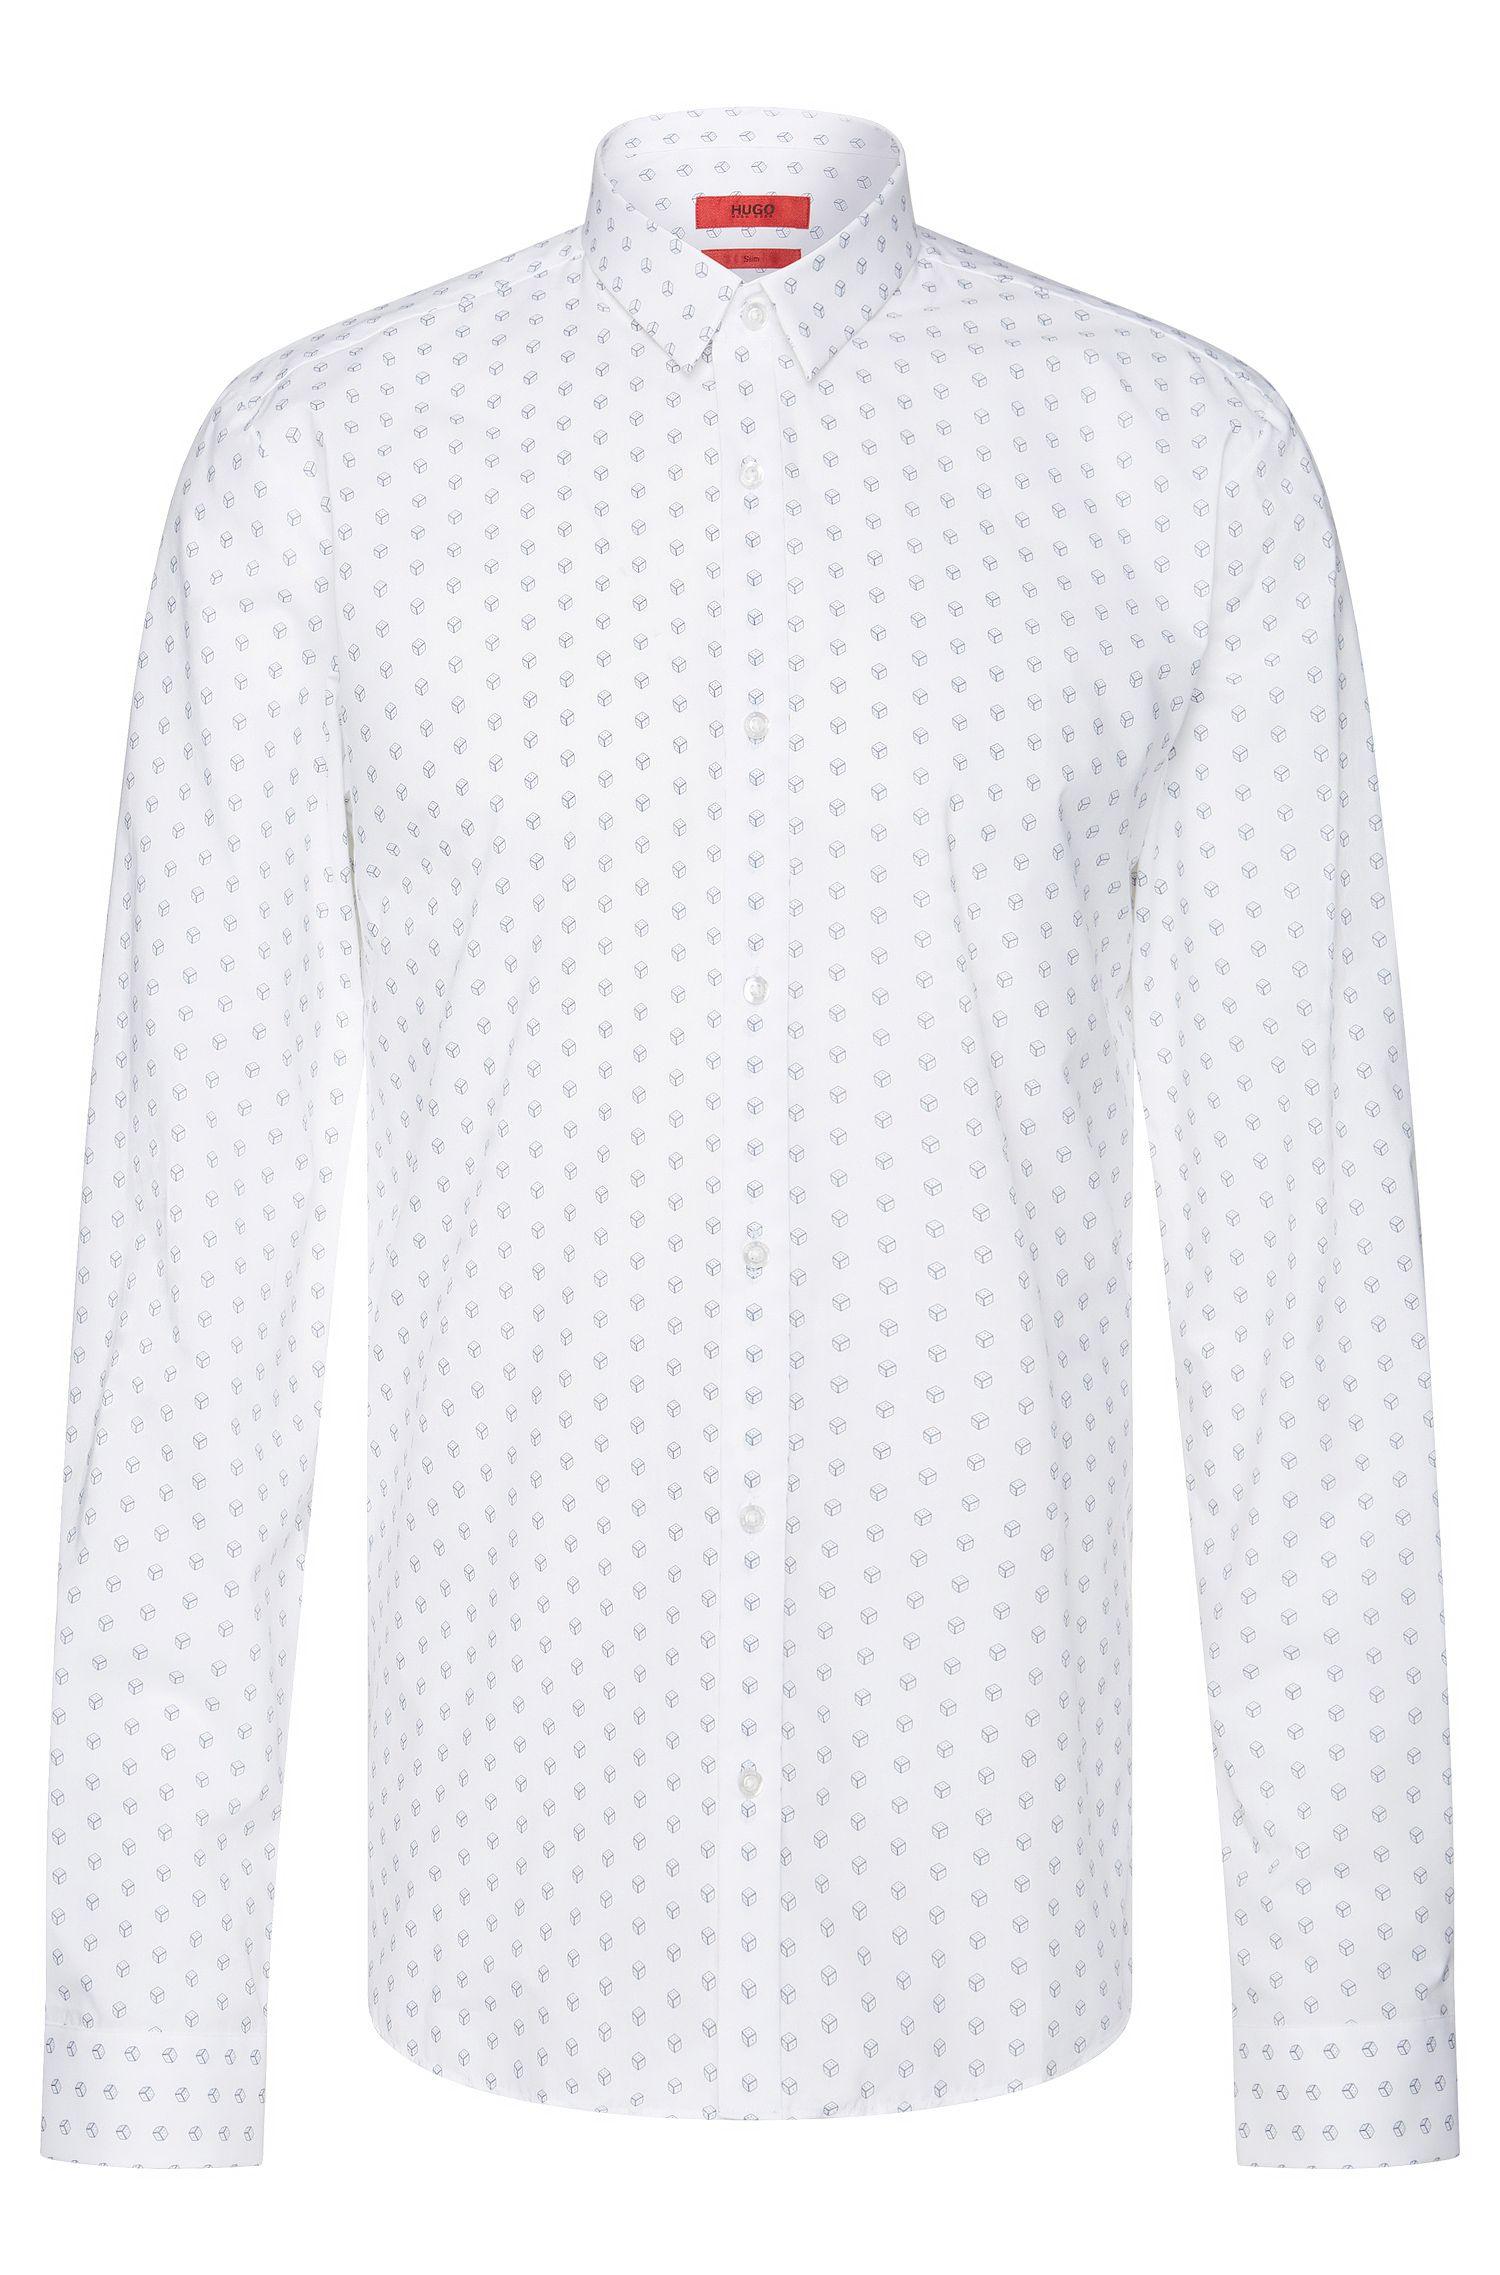 'Ero' | Slim Fit, Stretch Cotton Dice Button Down Shirt